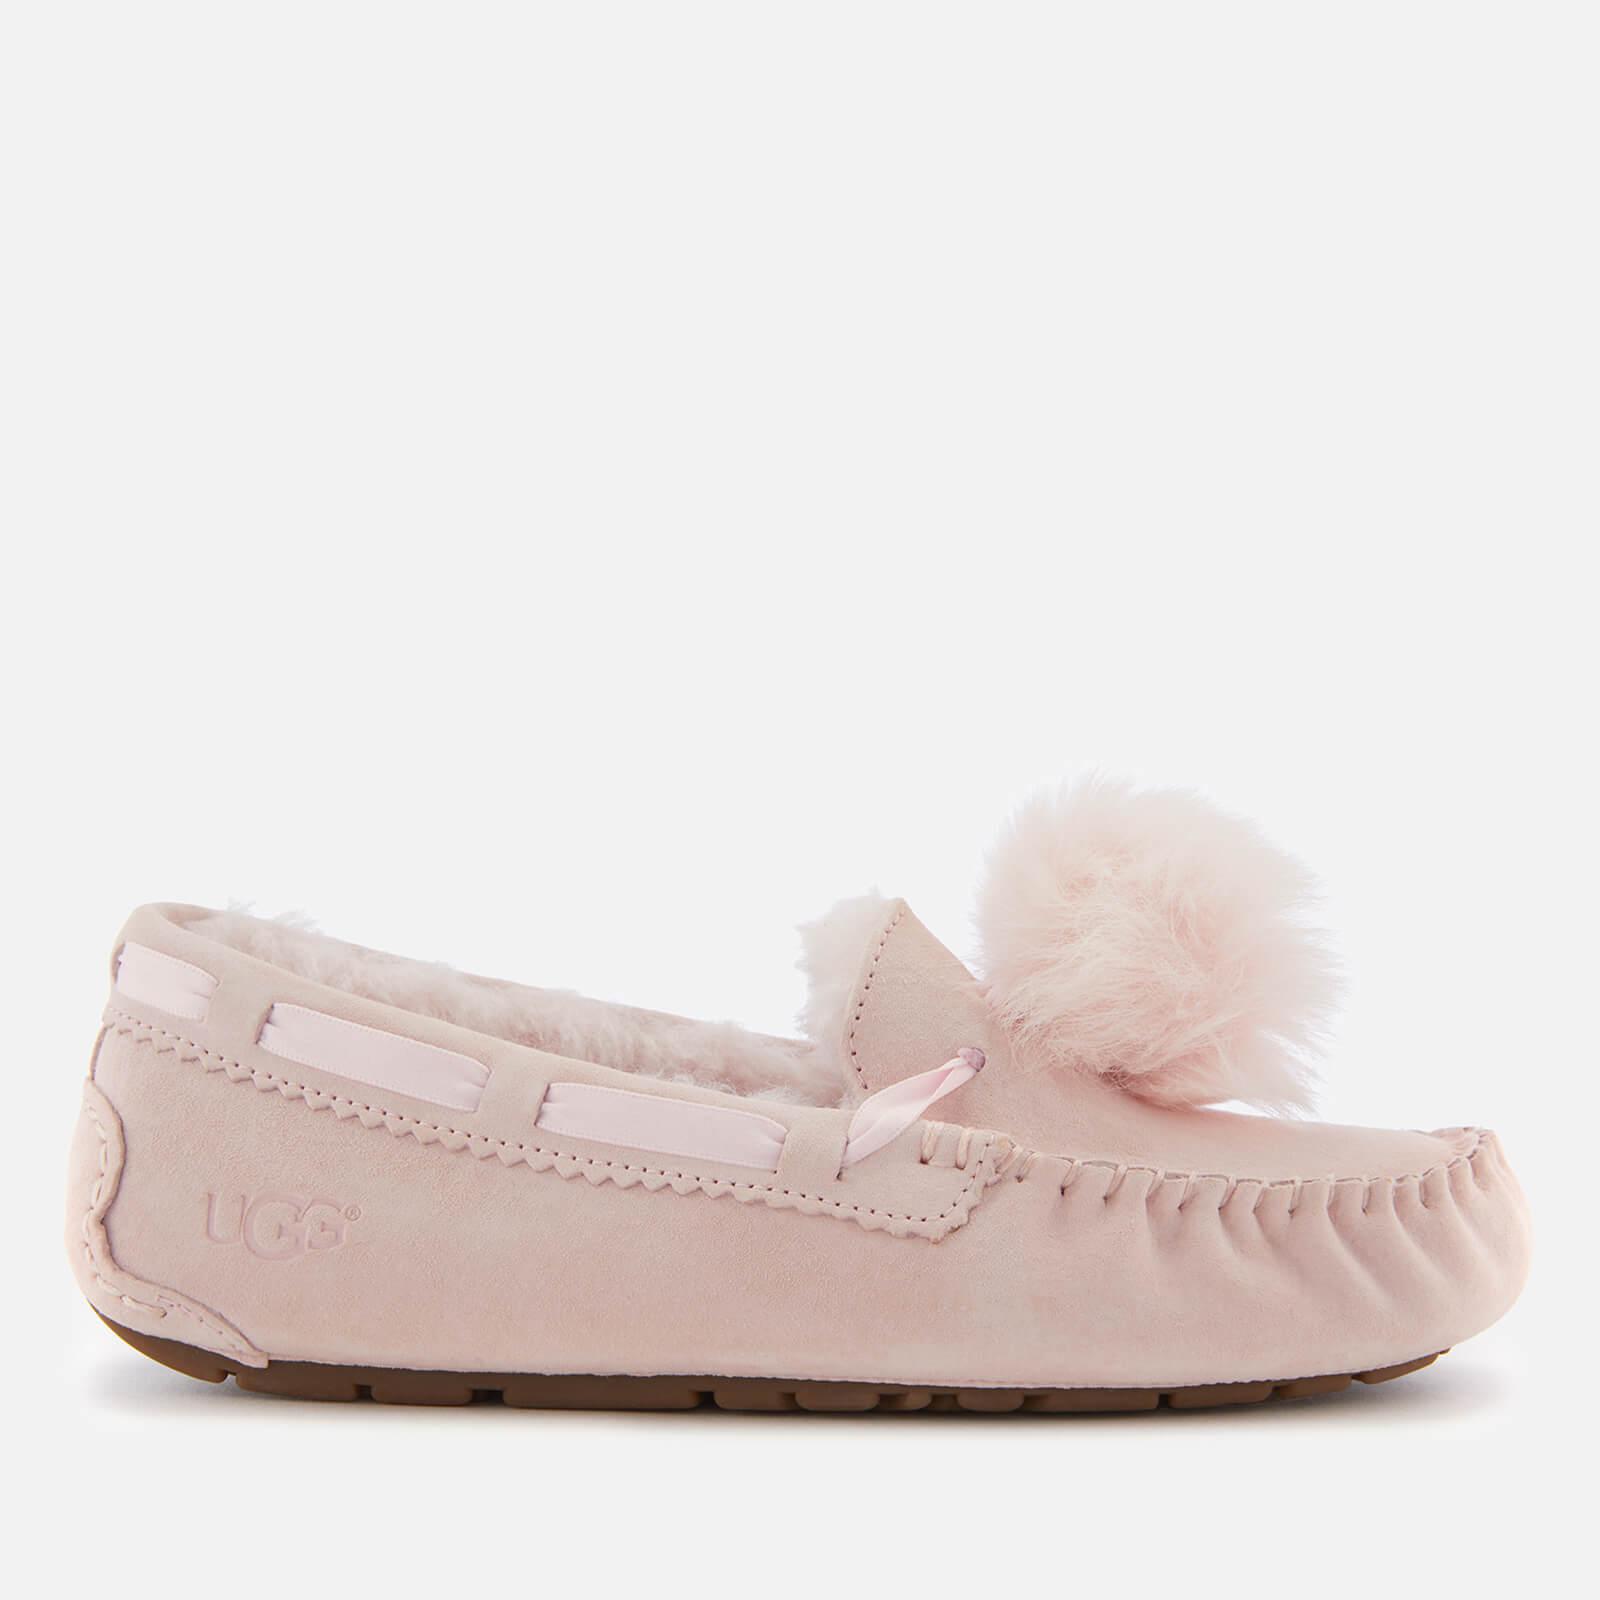 158c35bdacc UGG Women's Dakota Moccasin Suede Slippers - Seashell Pink